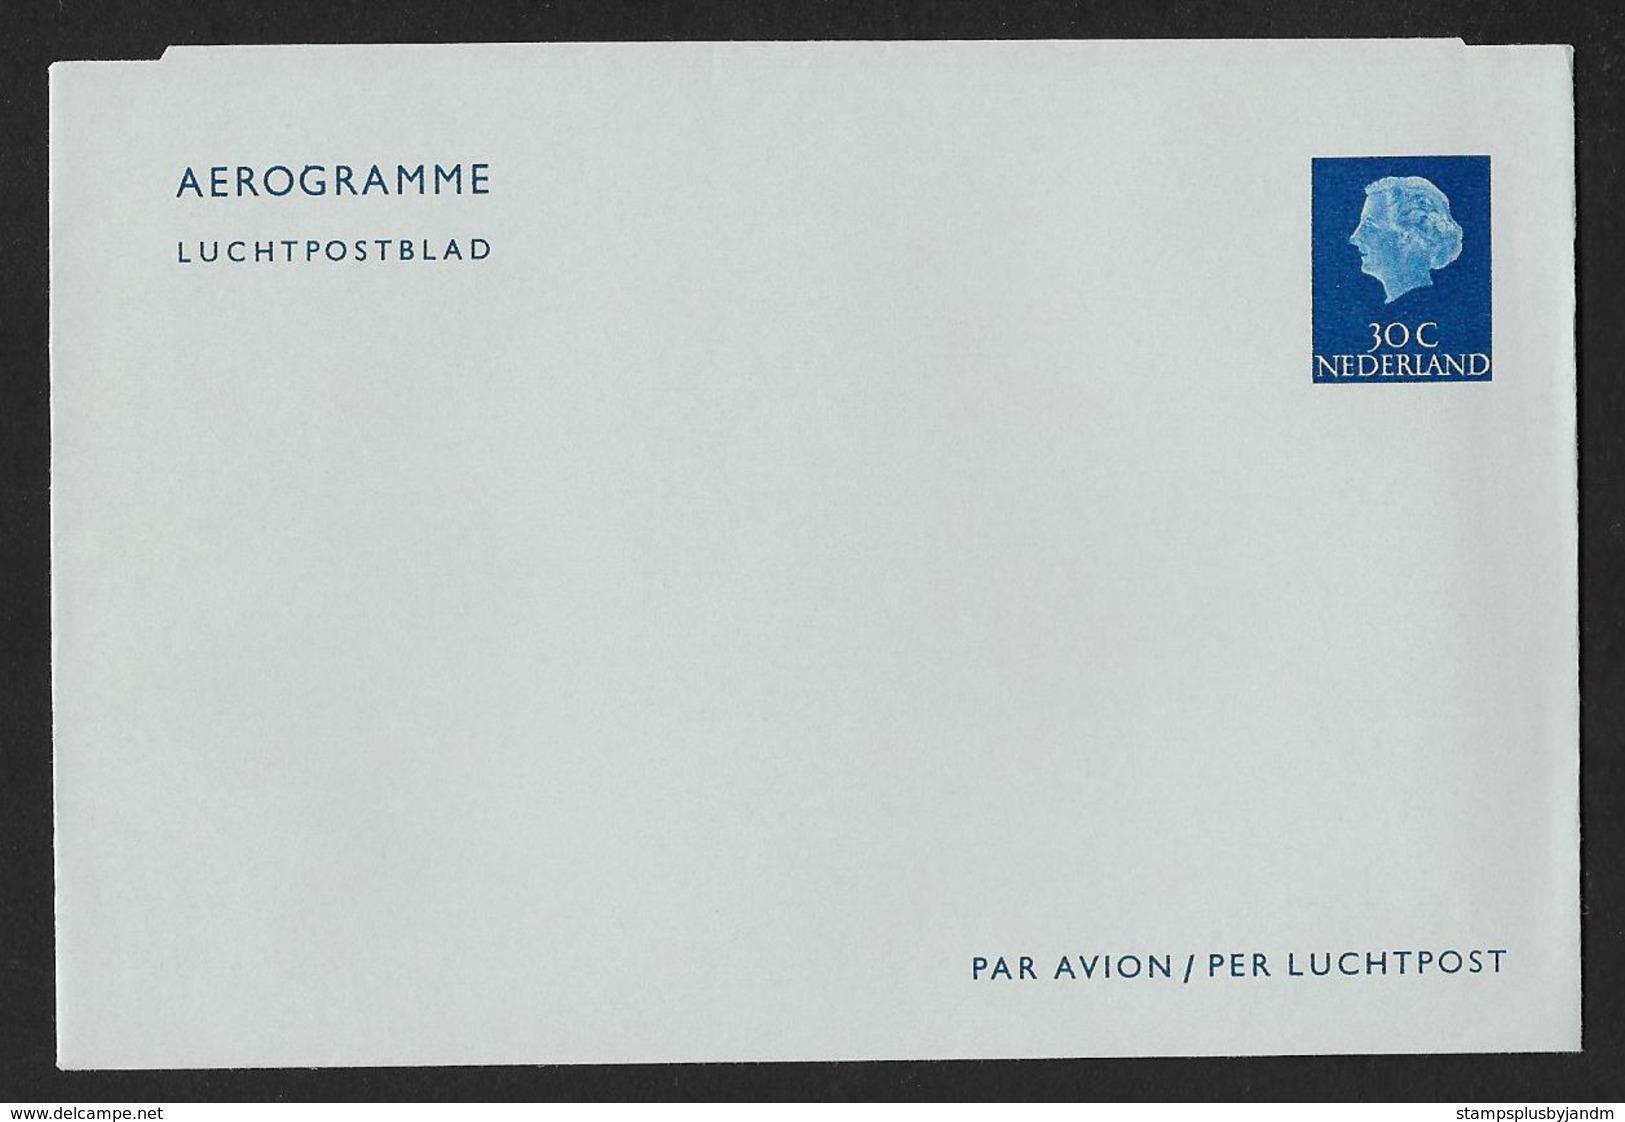 NETHERLANDS Aerogramme 30c Queen C1950s-1960s Unused! STK#X21172 - Postal Stationery